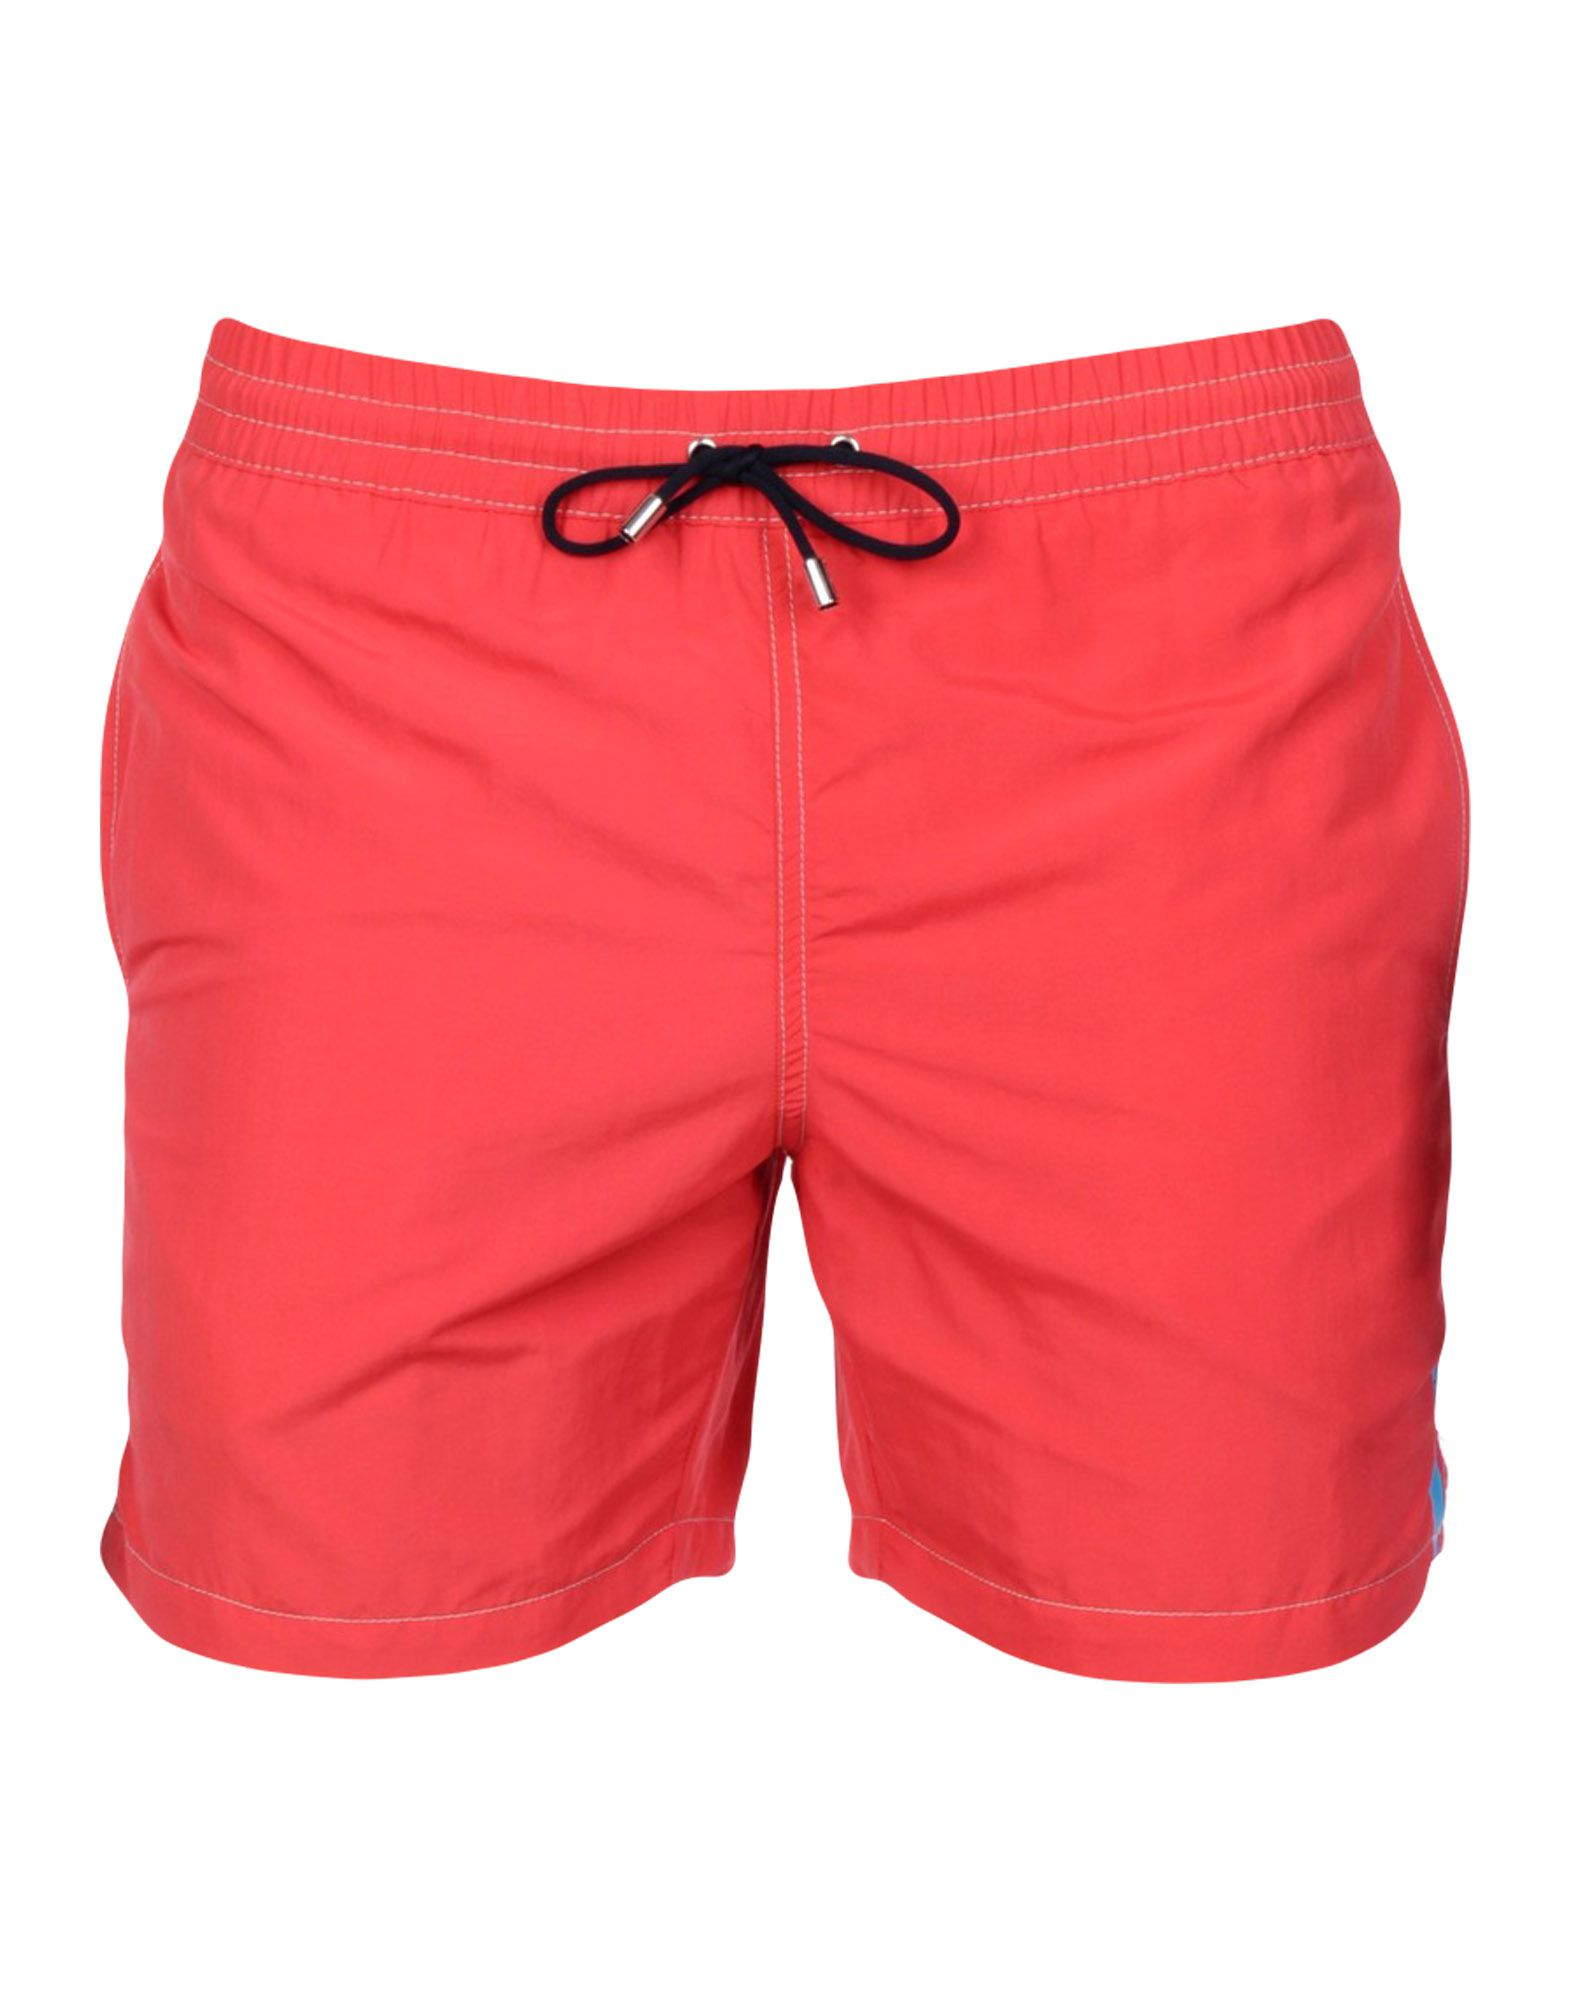 BYBLOS BEACHWEAR Шорты для плавания byblos толстовка для девочки bj5928 разноцветный byblos